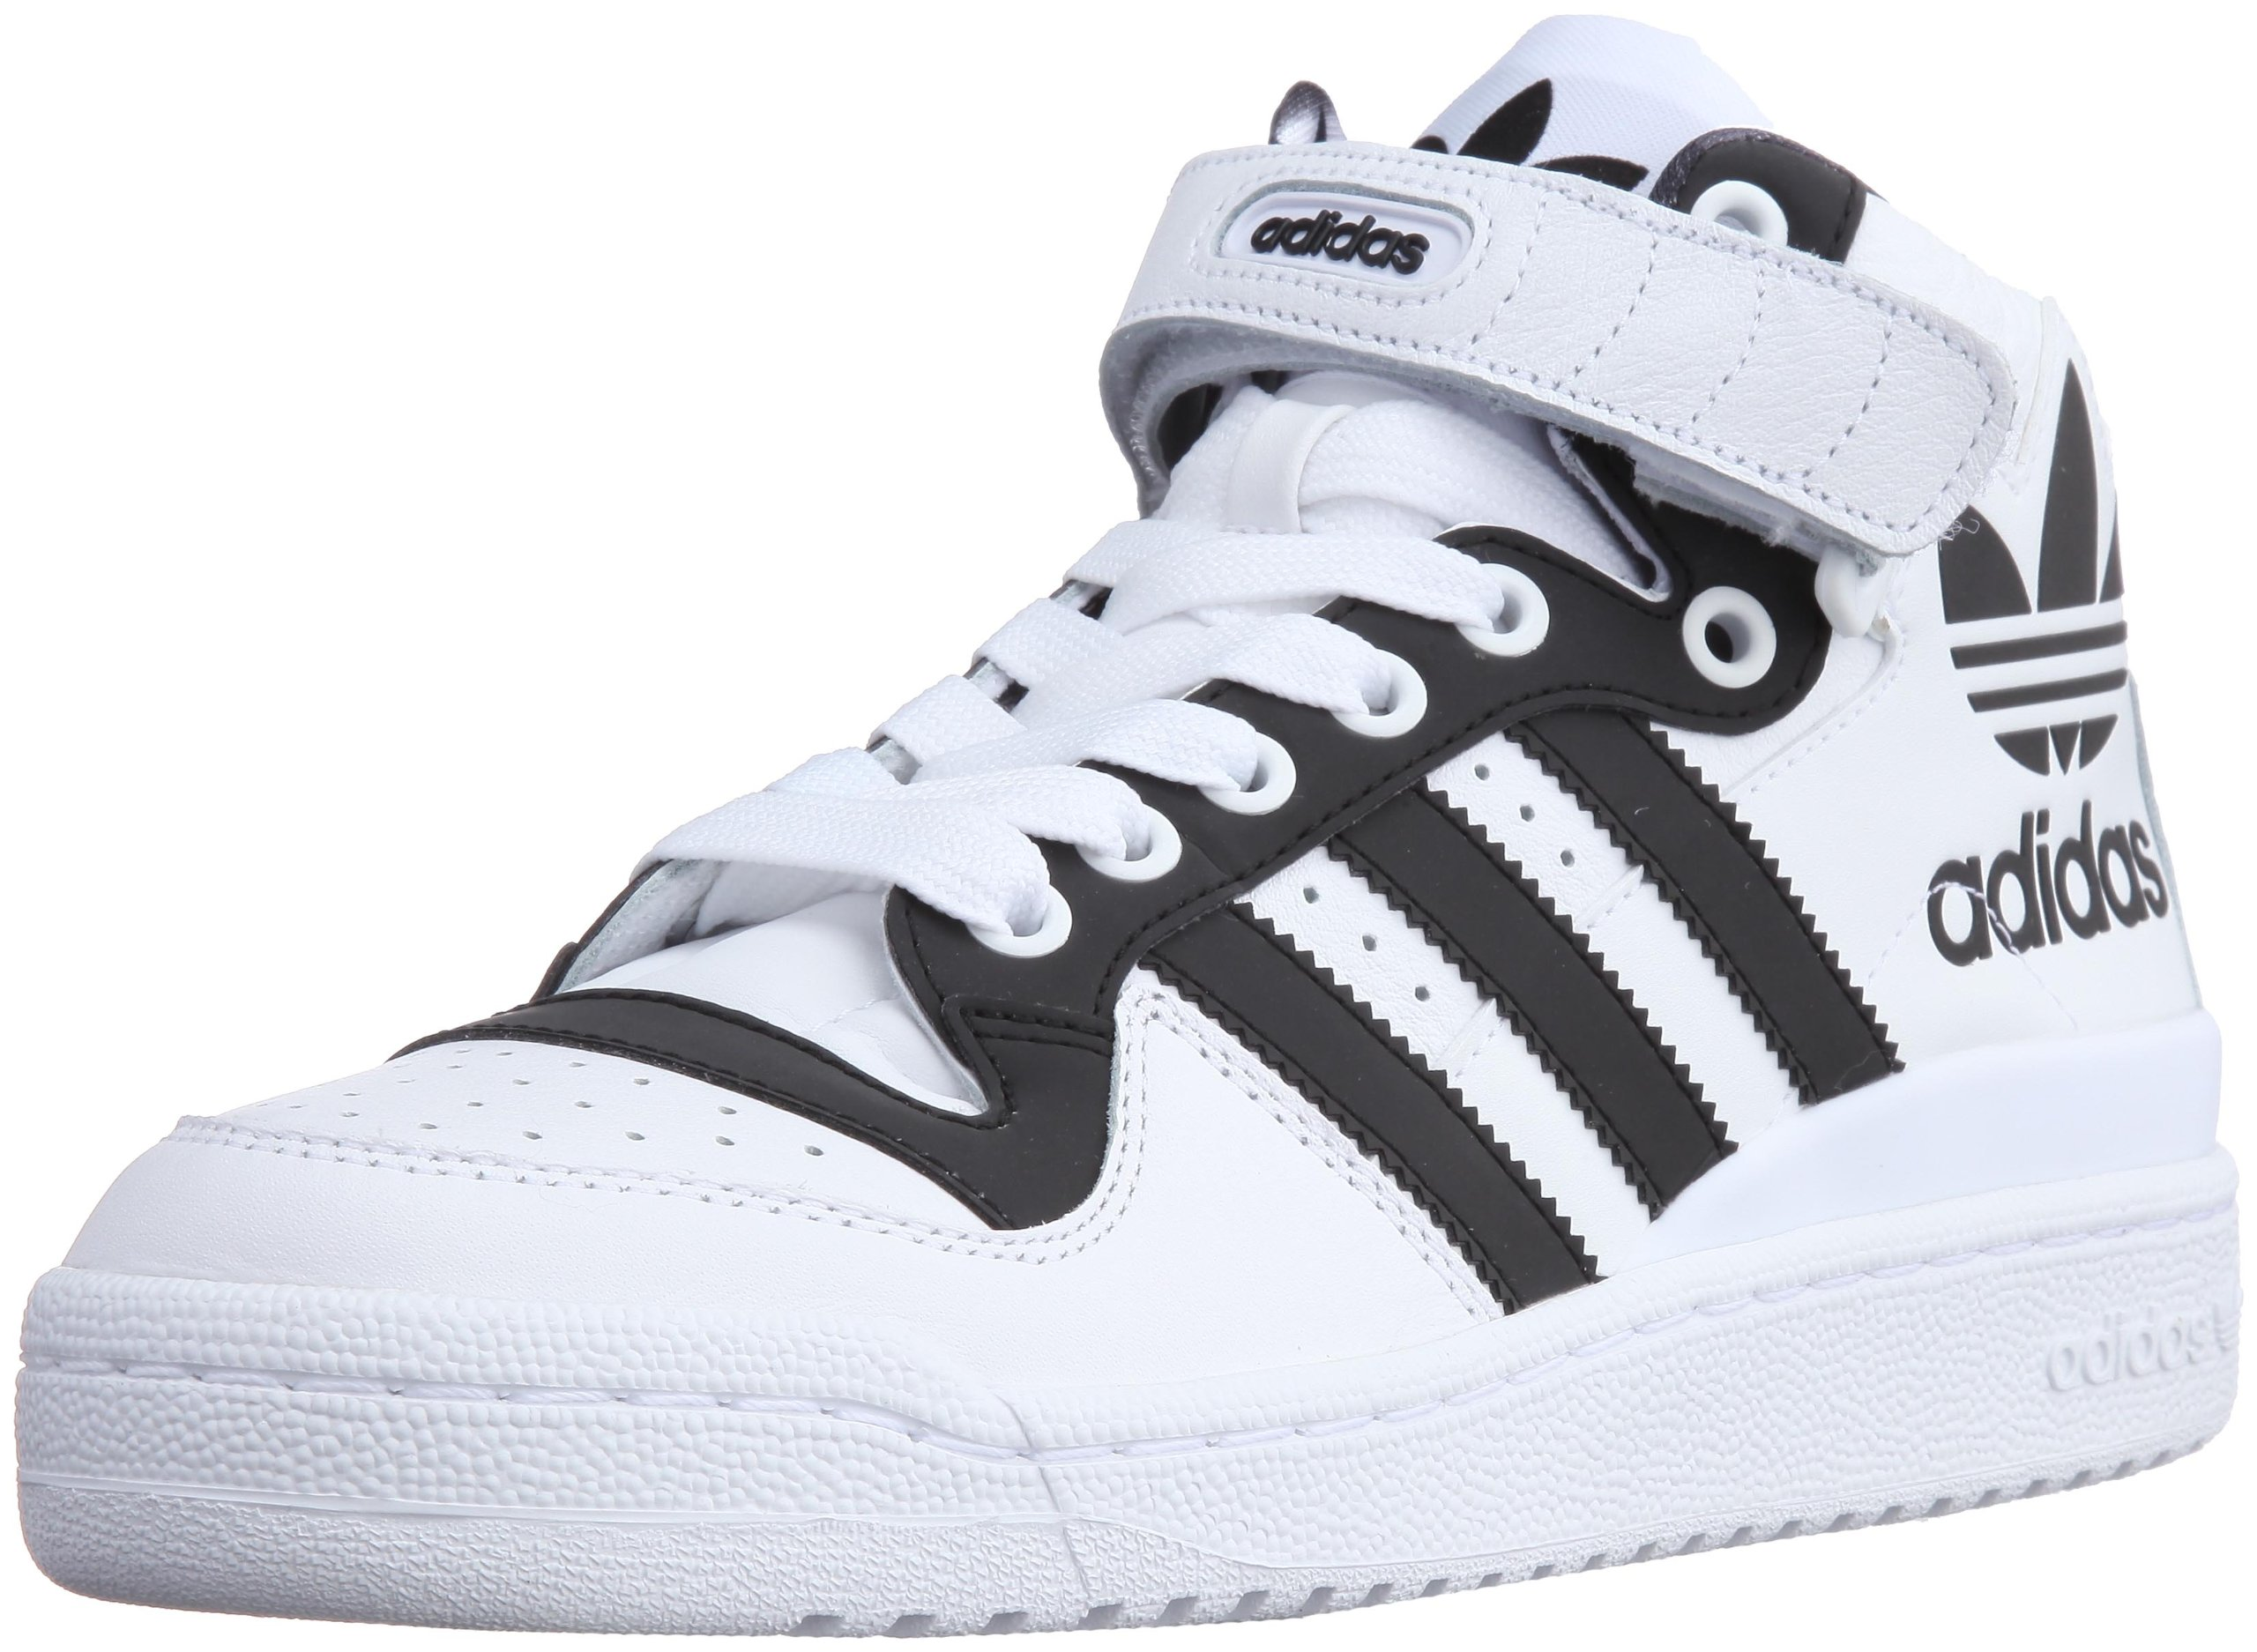 cheap for discount cc2fe e714e Galleon - Adidas Originals Forum Mid RS XL Mens Trainers Hi Tops G43878 White  Black Sneakers Shoes (uk 8 Us 8.5 Eu 42)